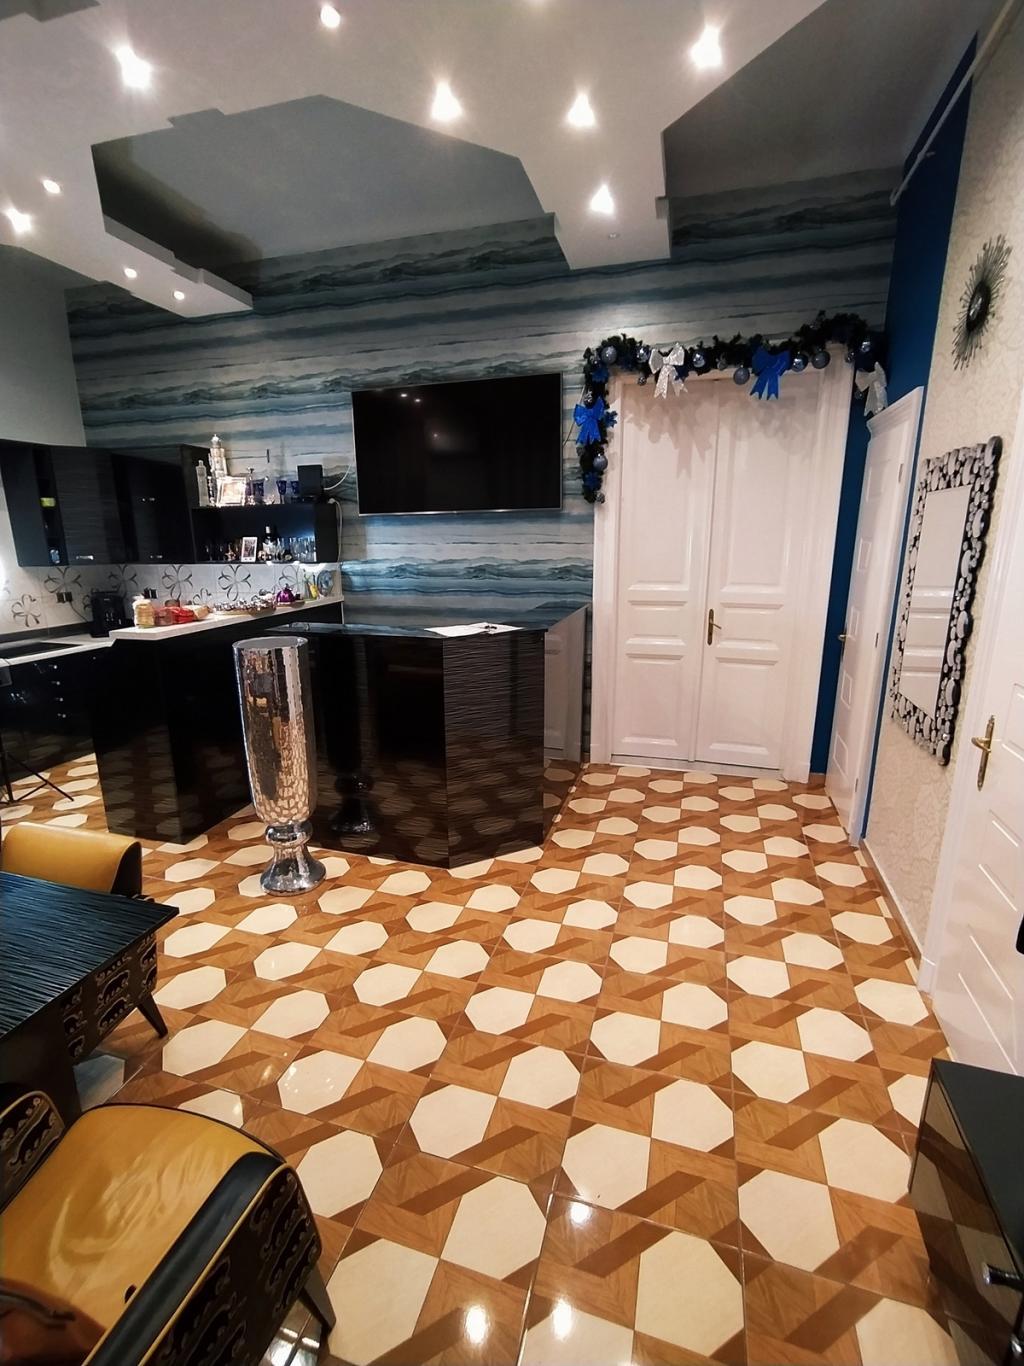 flat For sale 1086 Budapest Baross utca 67sqm 56M HUF Property image: 1